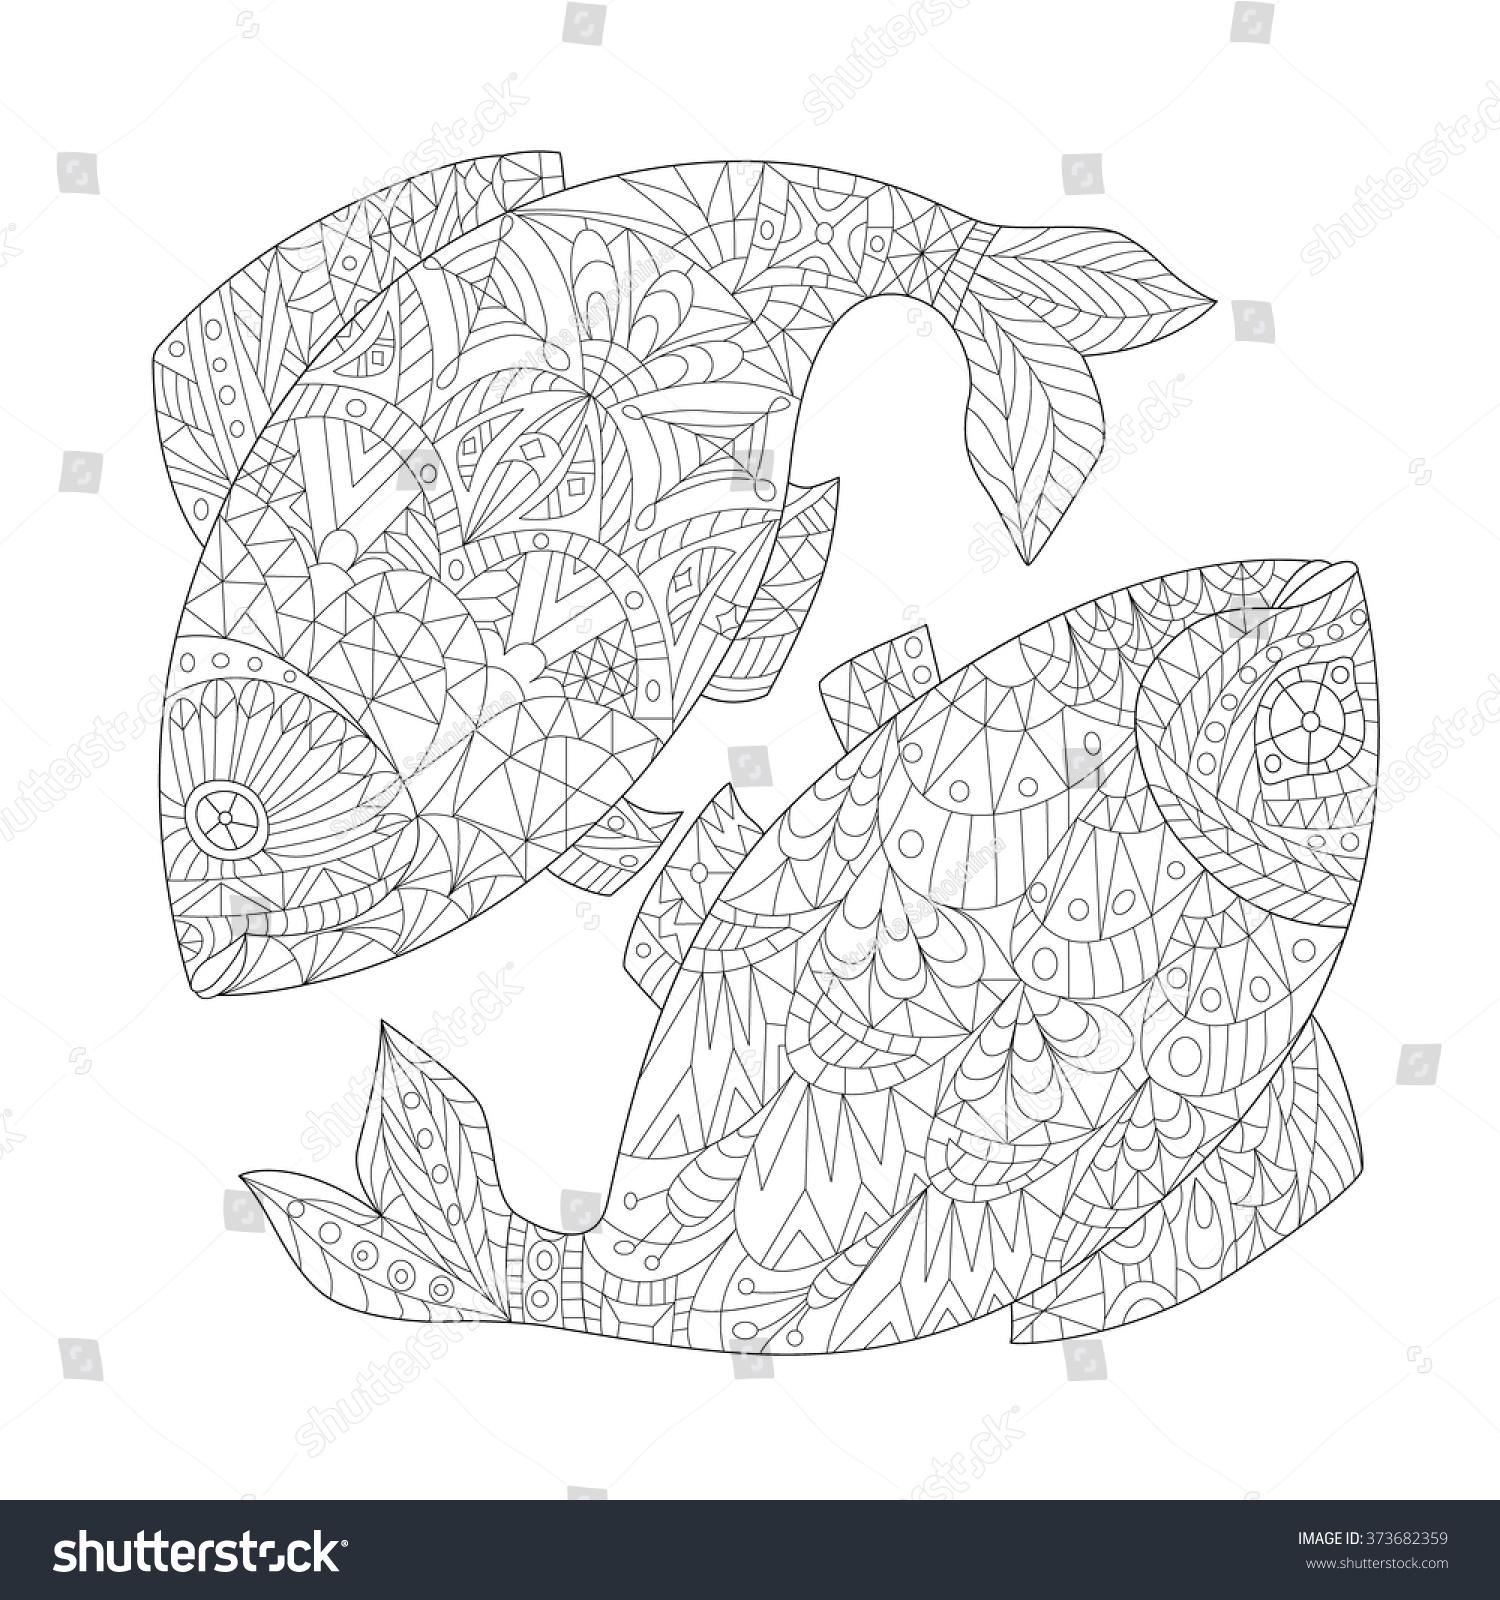 Handdrawn Zodiac Pisces Ethnic Floral Geometric Stock Vector